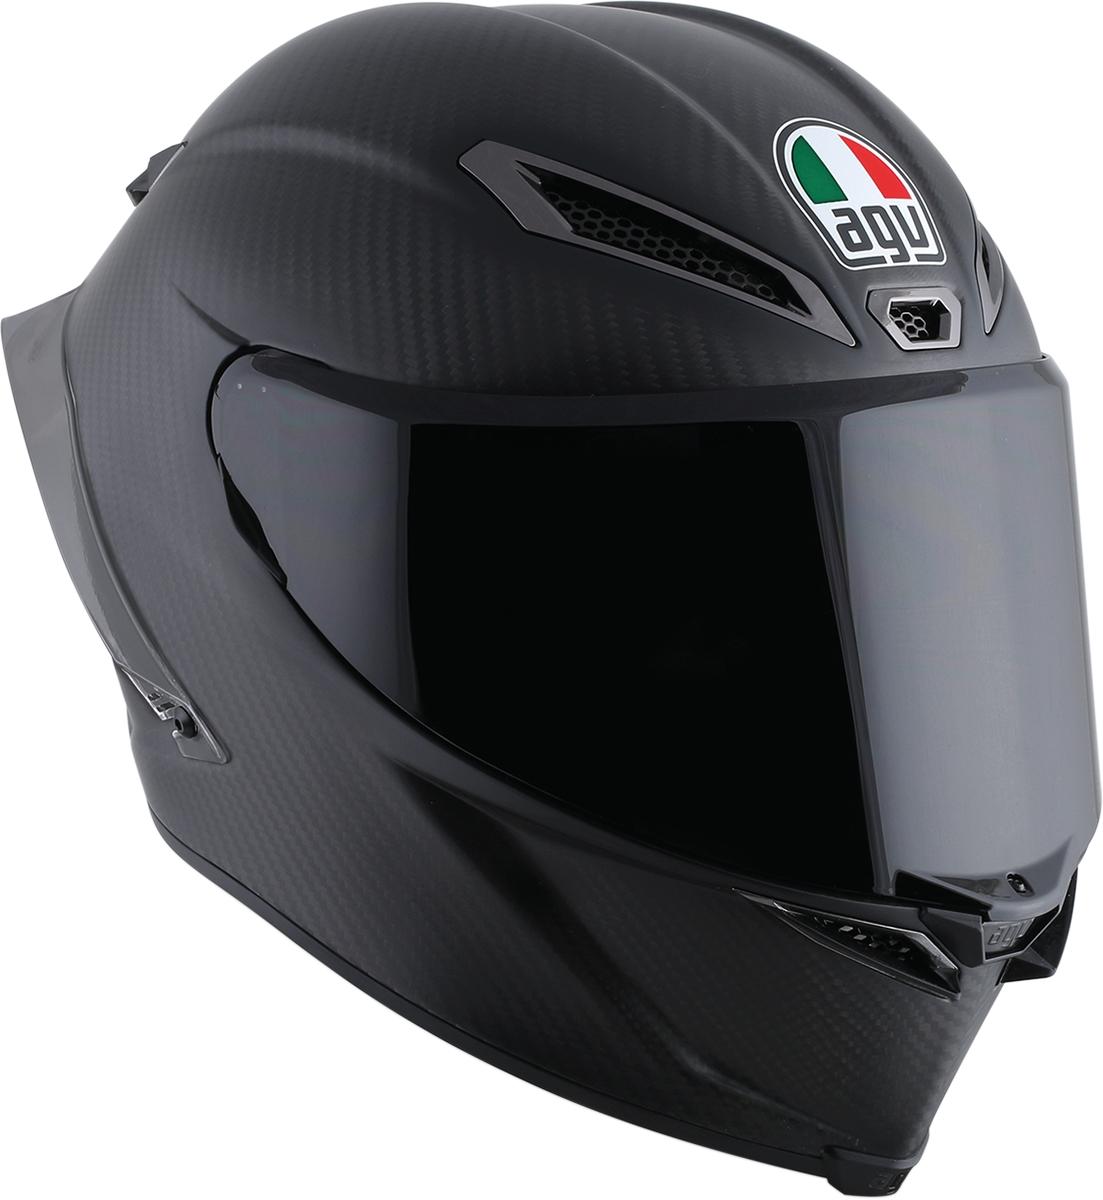 Agv Pista Gp R Matte Carbon Fiber Helmet Super Lightweight Motorcycle Road Race Ebay